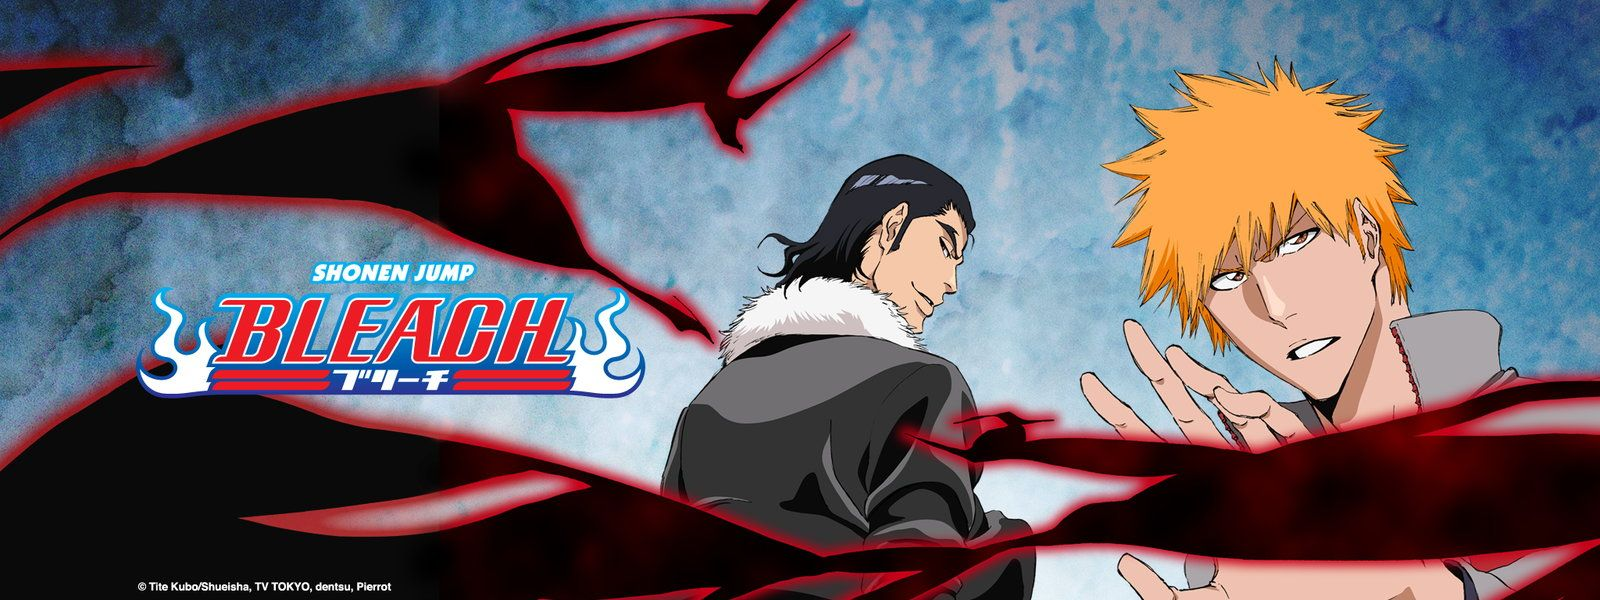 Bleach Bleach episodes, Anime episodes, Anime